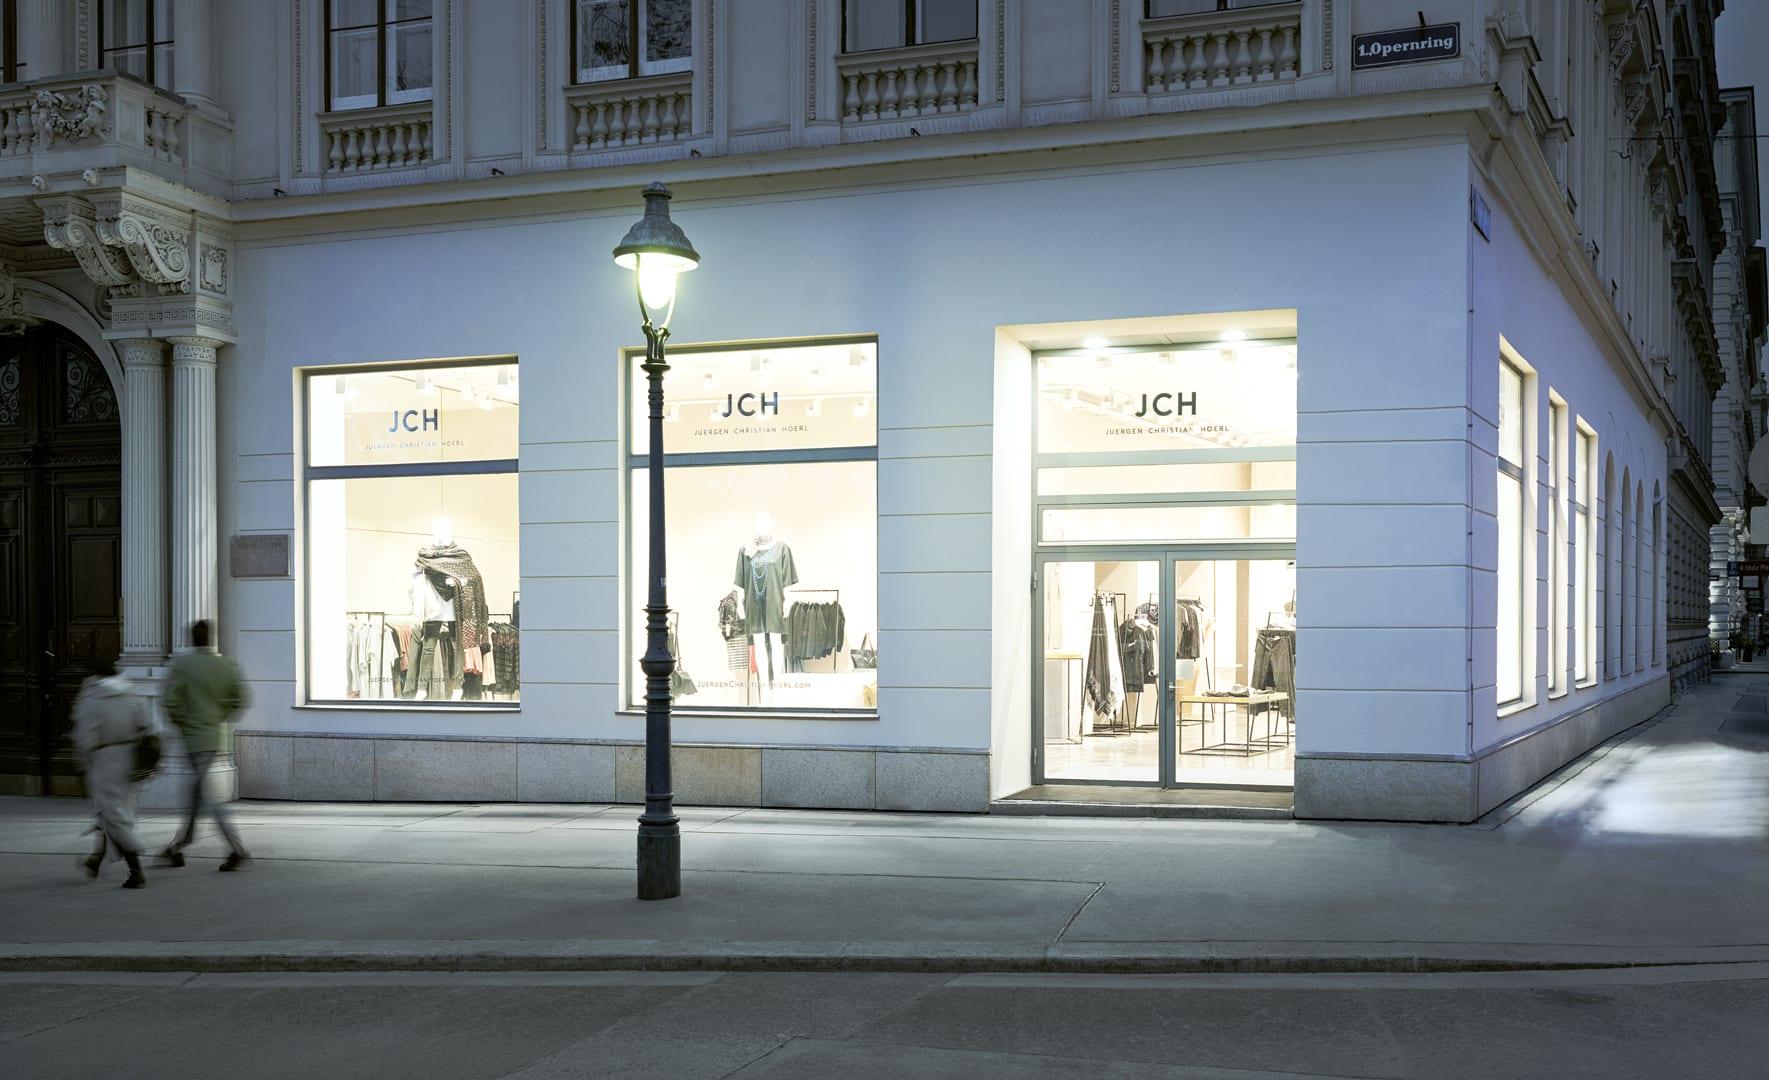 JCH Wien Aussenansicht